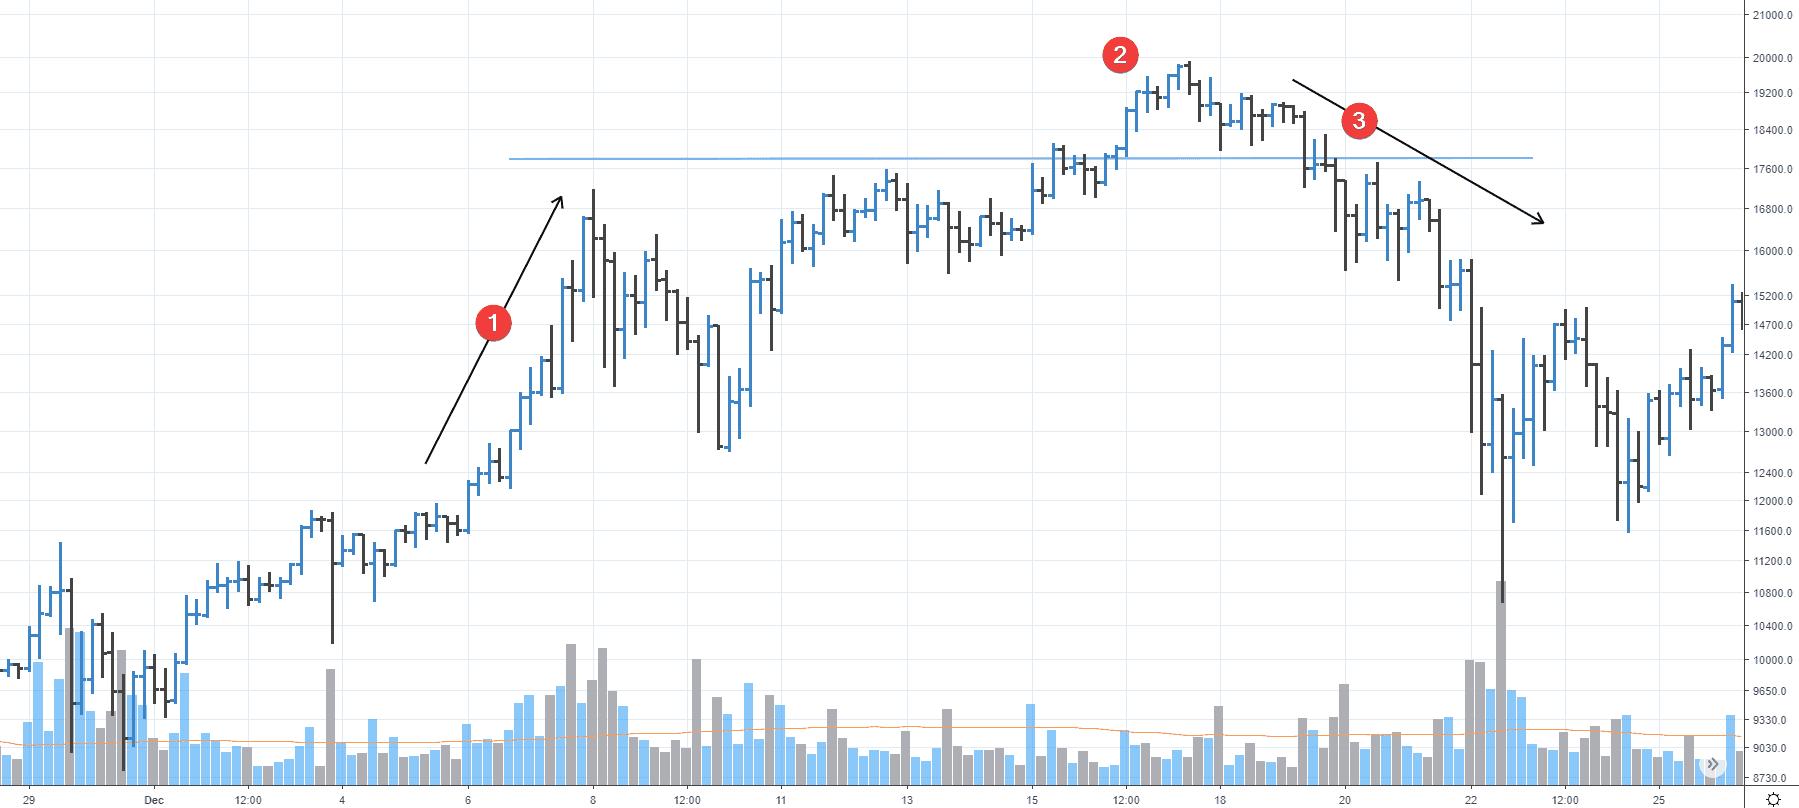 Кульминация покупок на рынке биткоина